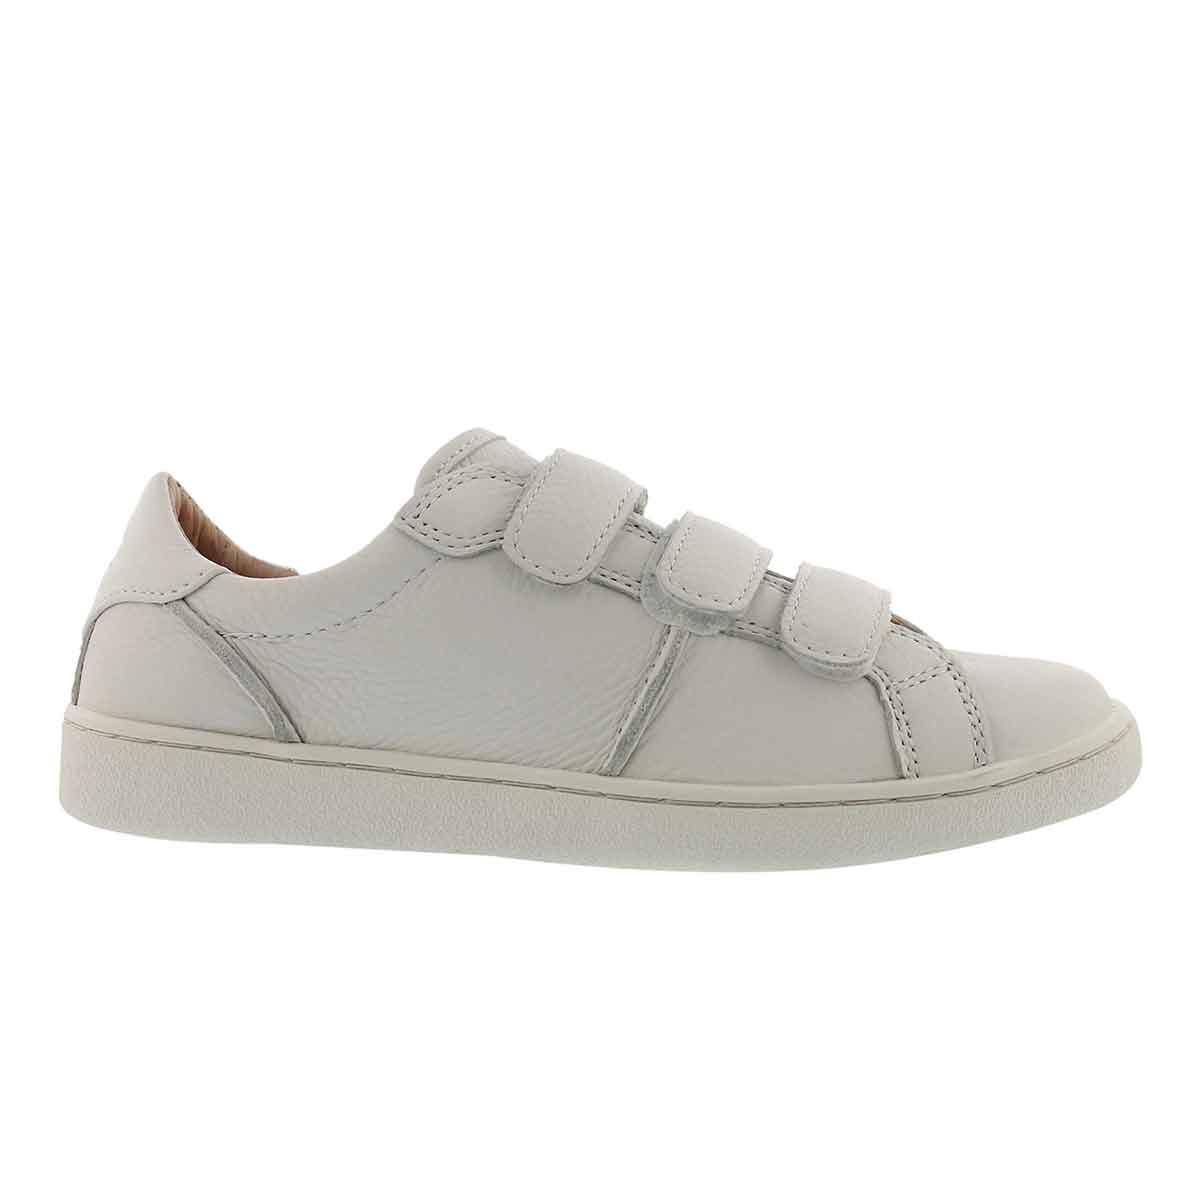 Lds Alix wht hook & loop casual sneaker